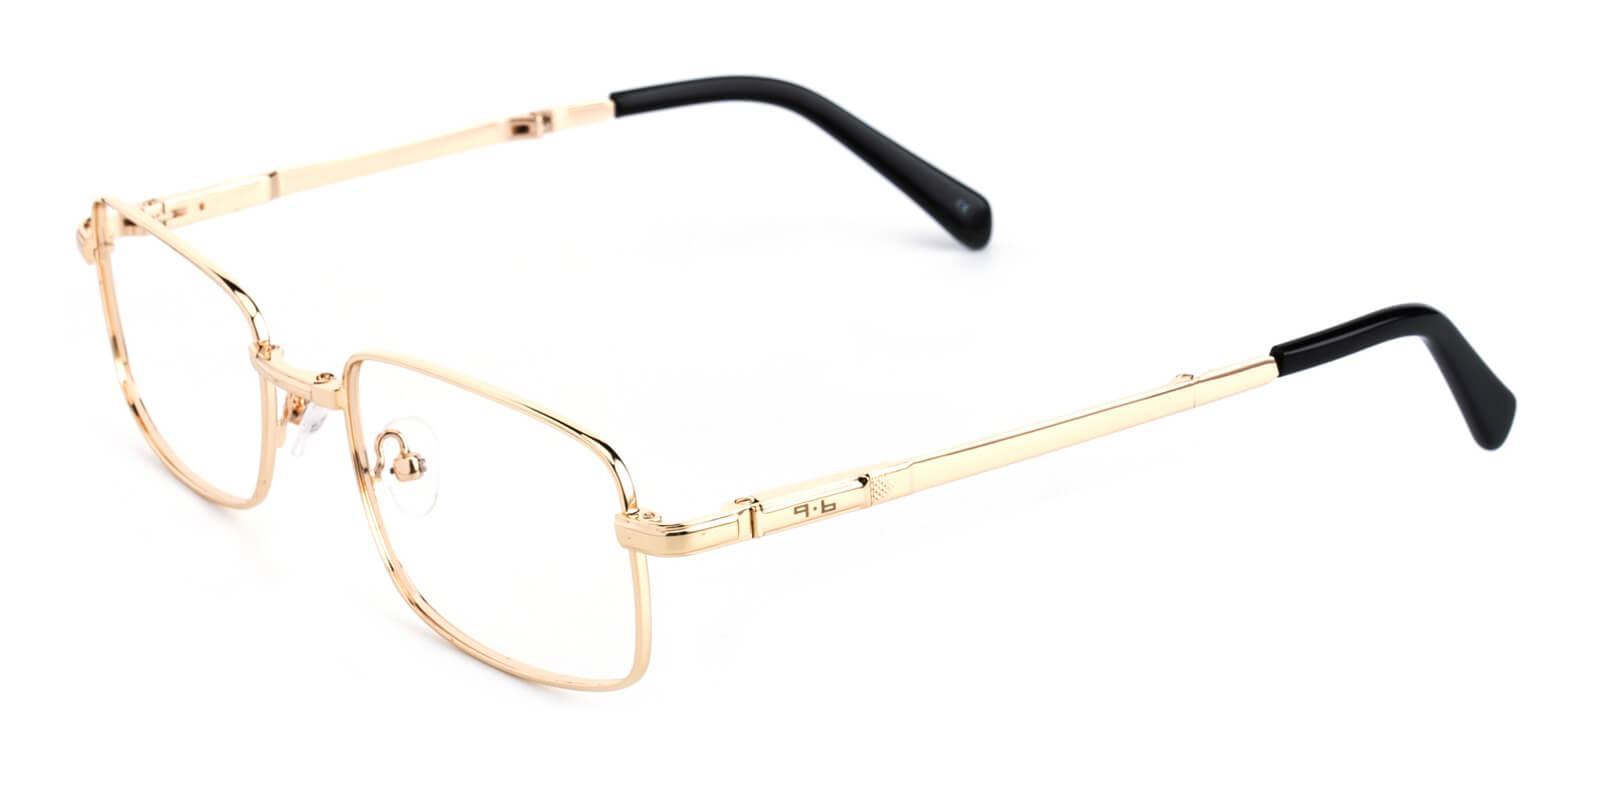 Norfolk-Gold-Rectangle-Metal-Eyeglasses-additional1